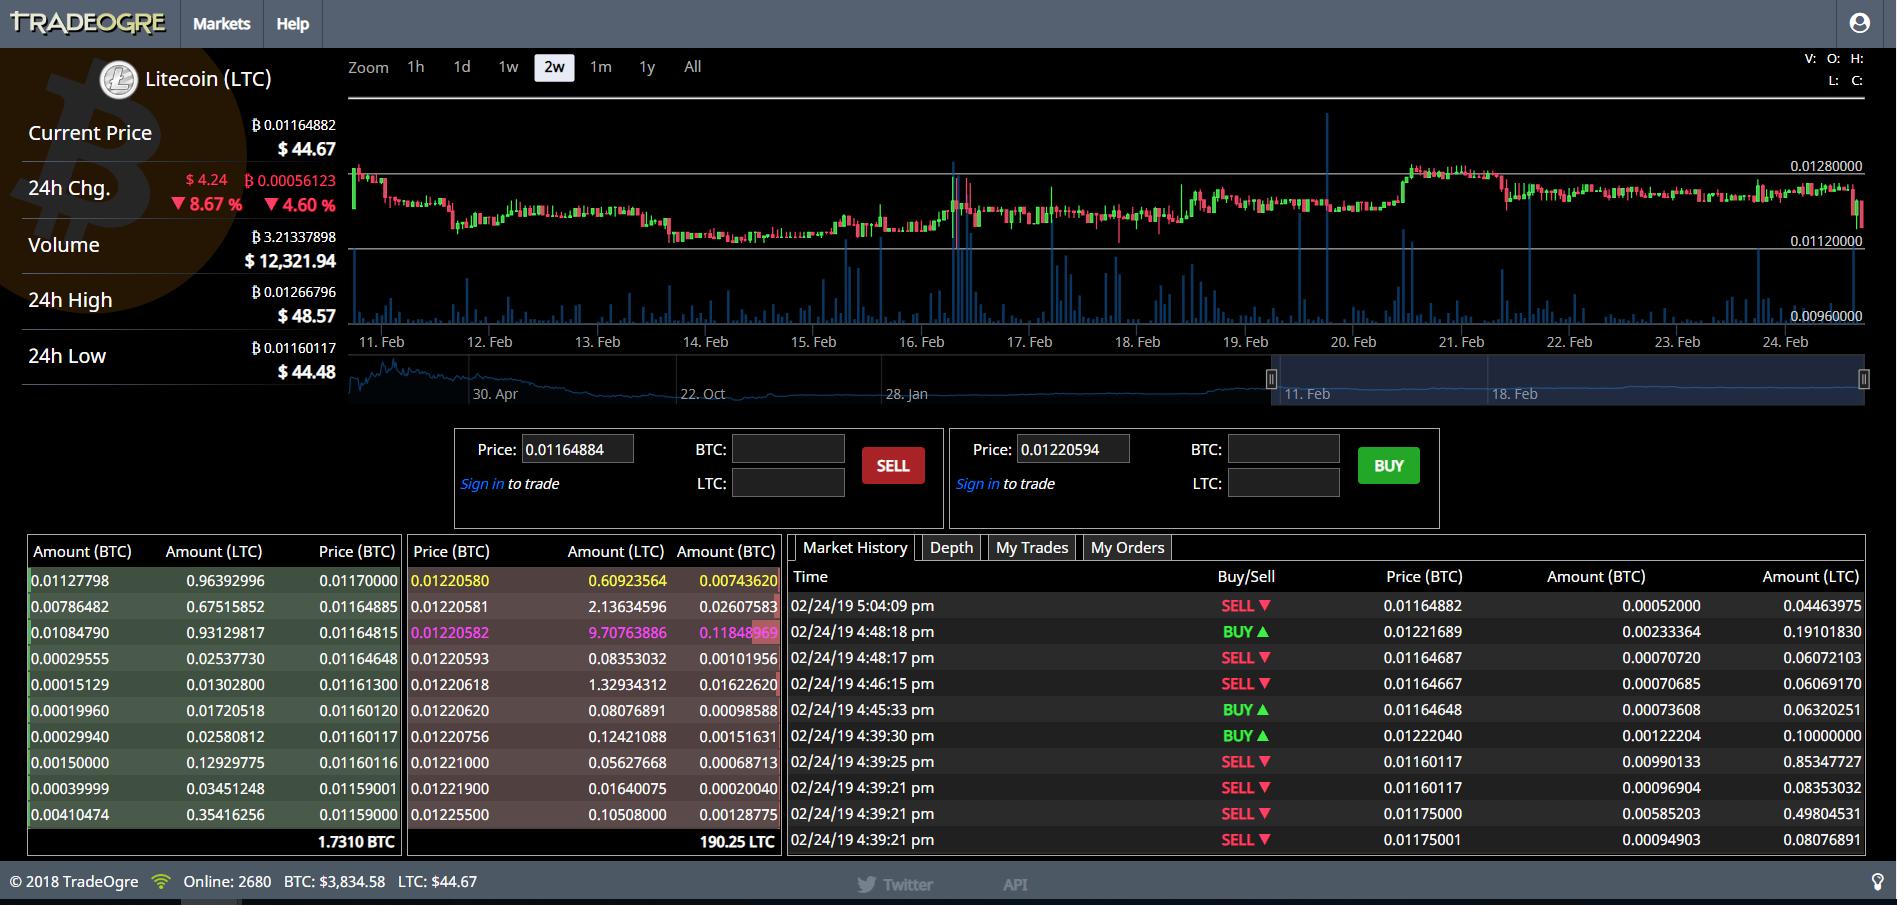 TradeOgre Trading View